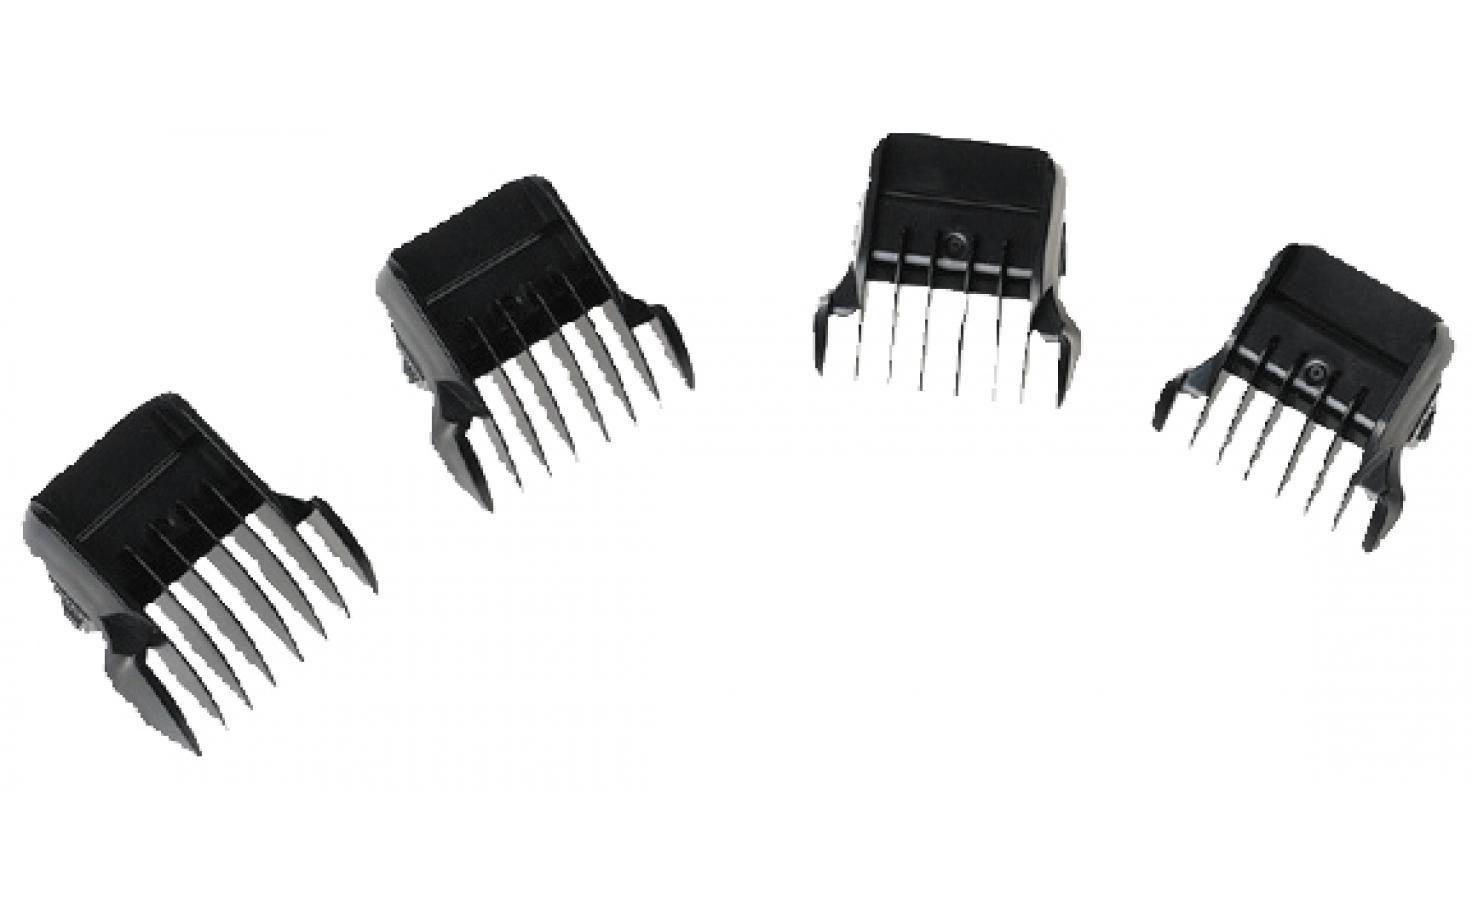 Tondeo ECO-Black M Aufsteckkammset 3,6,9,12 mm